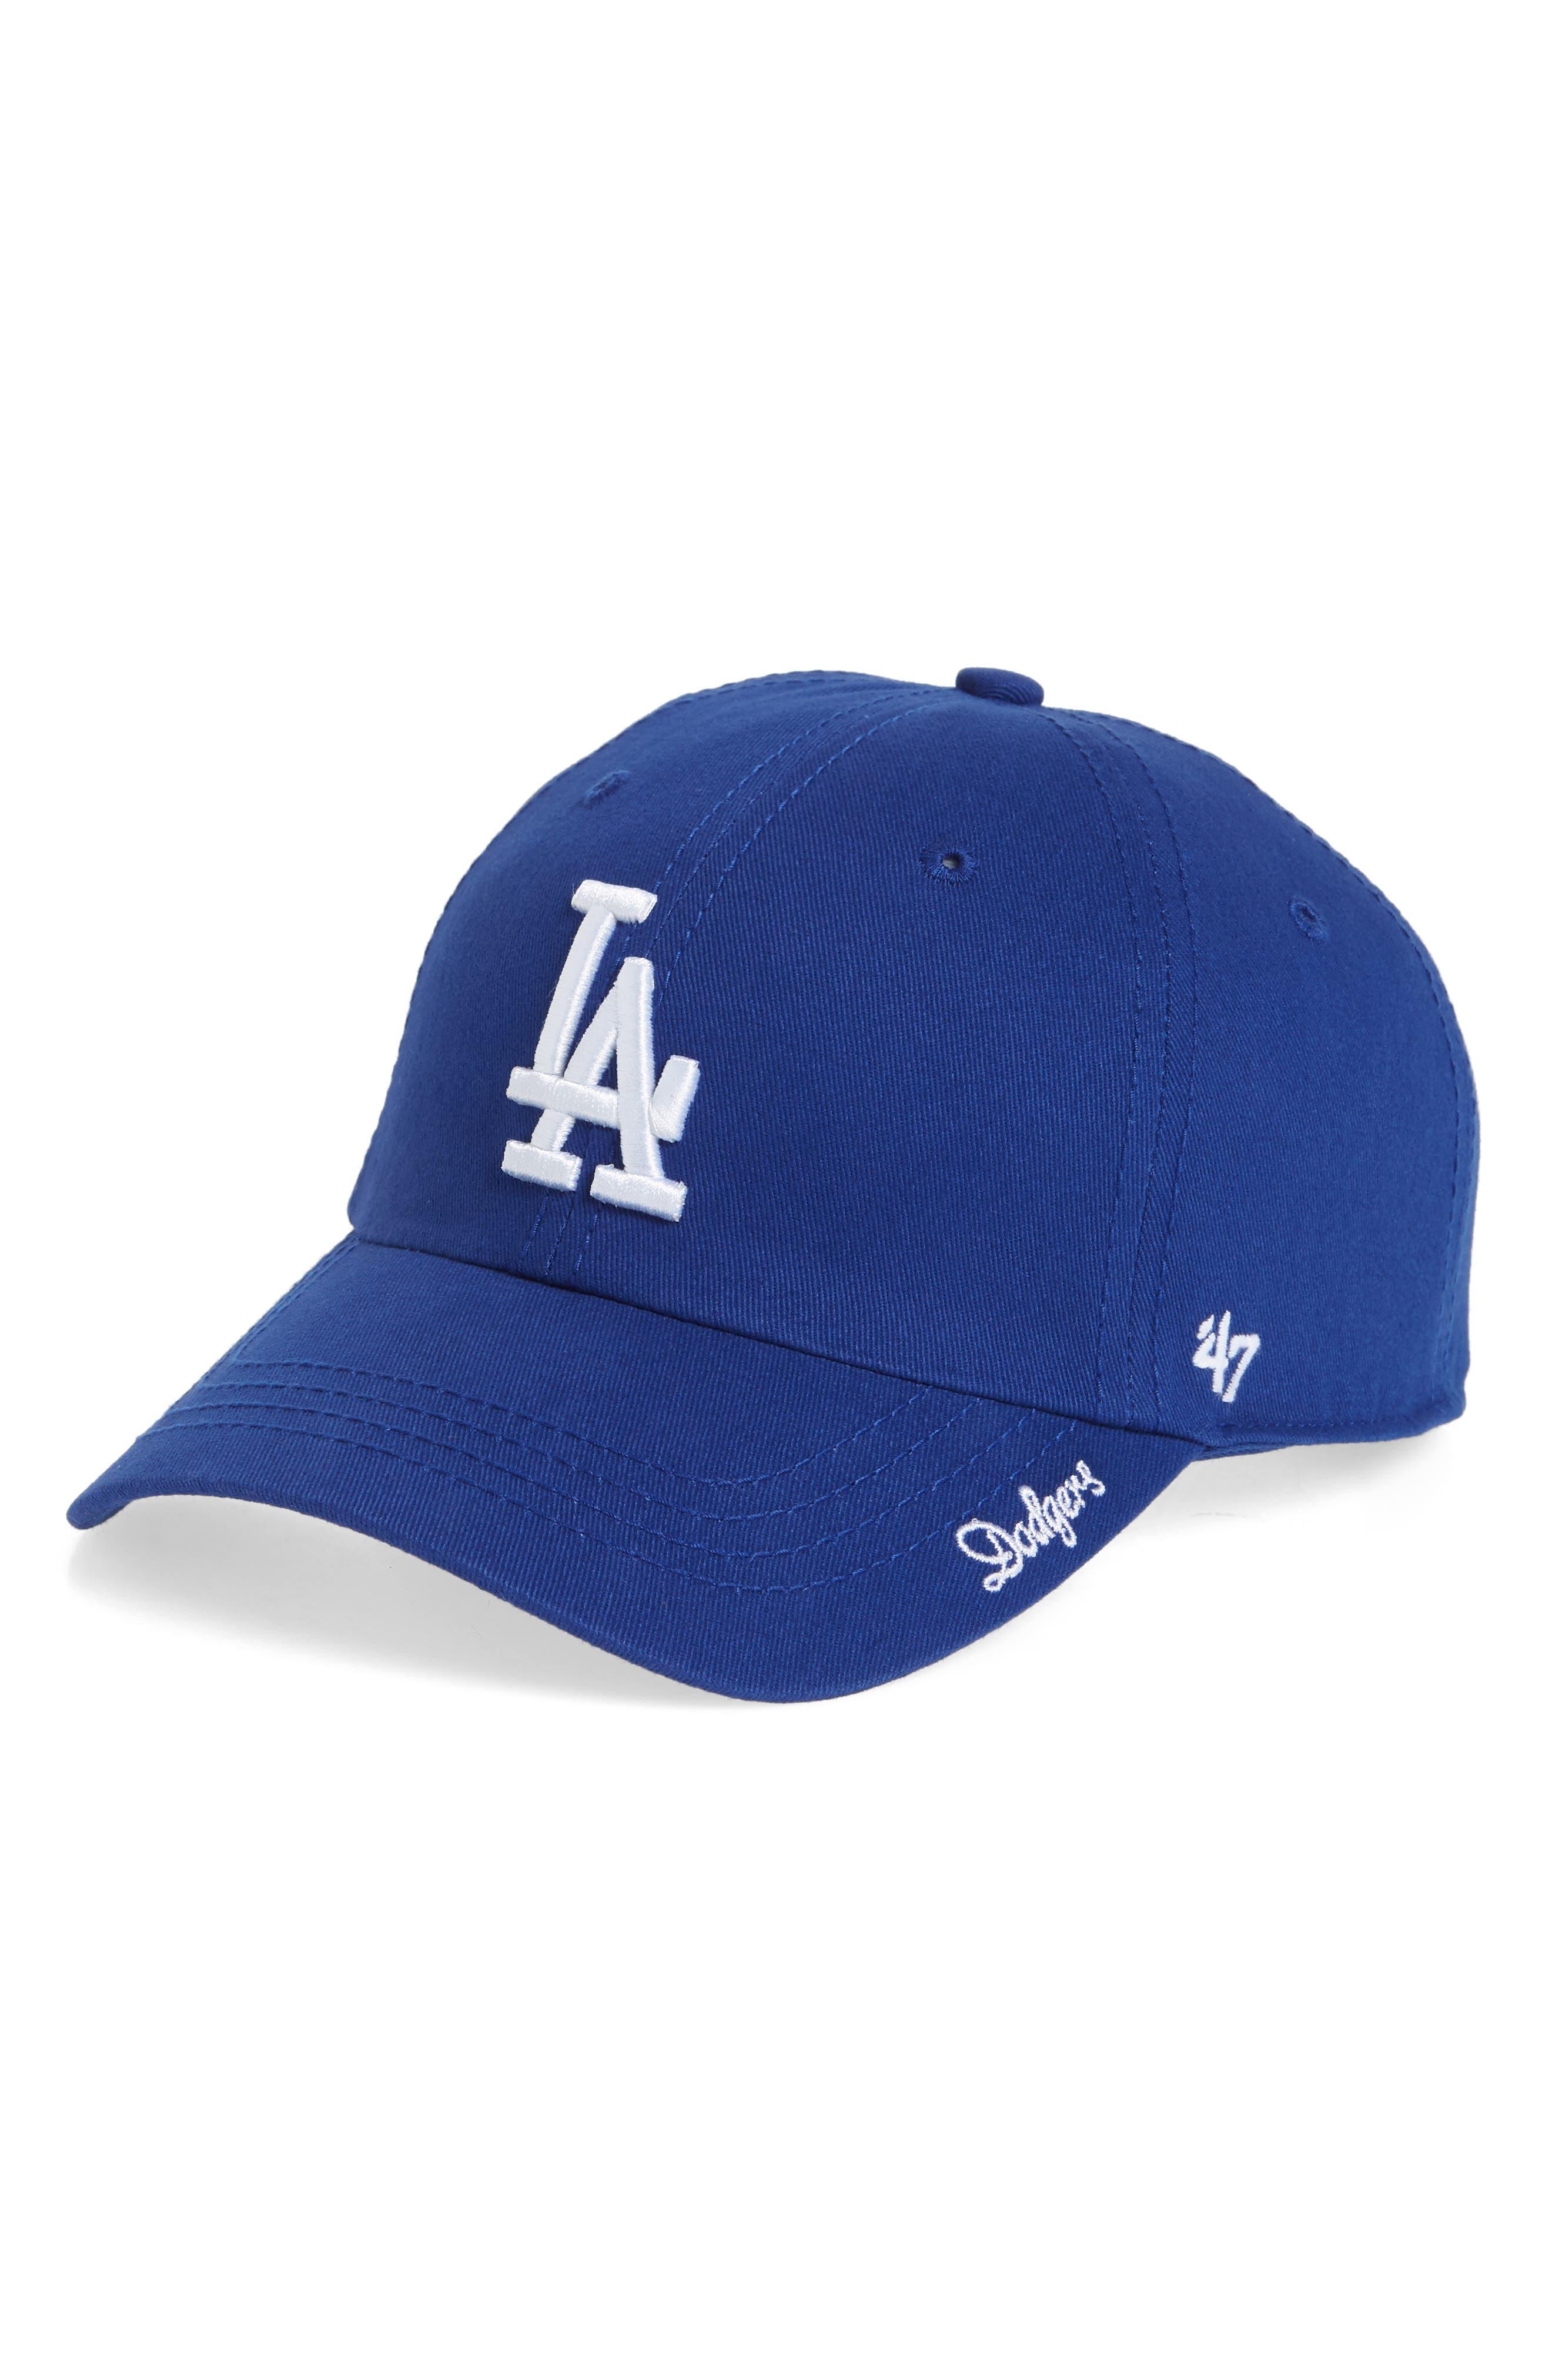 Miata Clean-Up Los Angeles Dodgers Baseball Cap,                             Main thumbnail 1, color,                             Royal